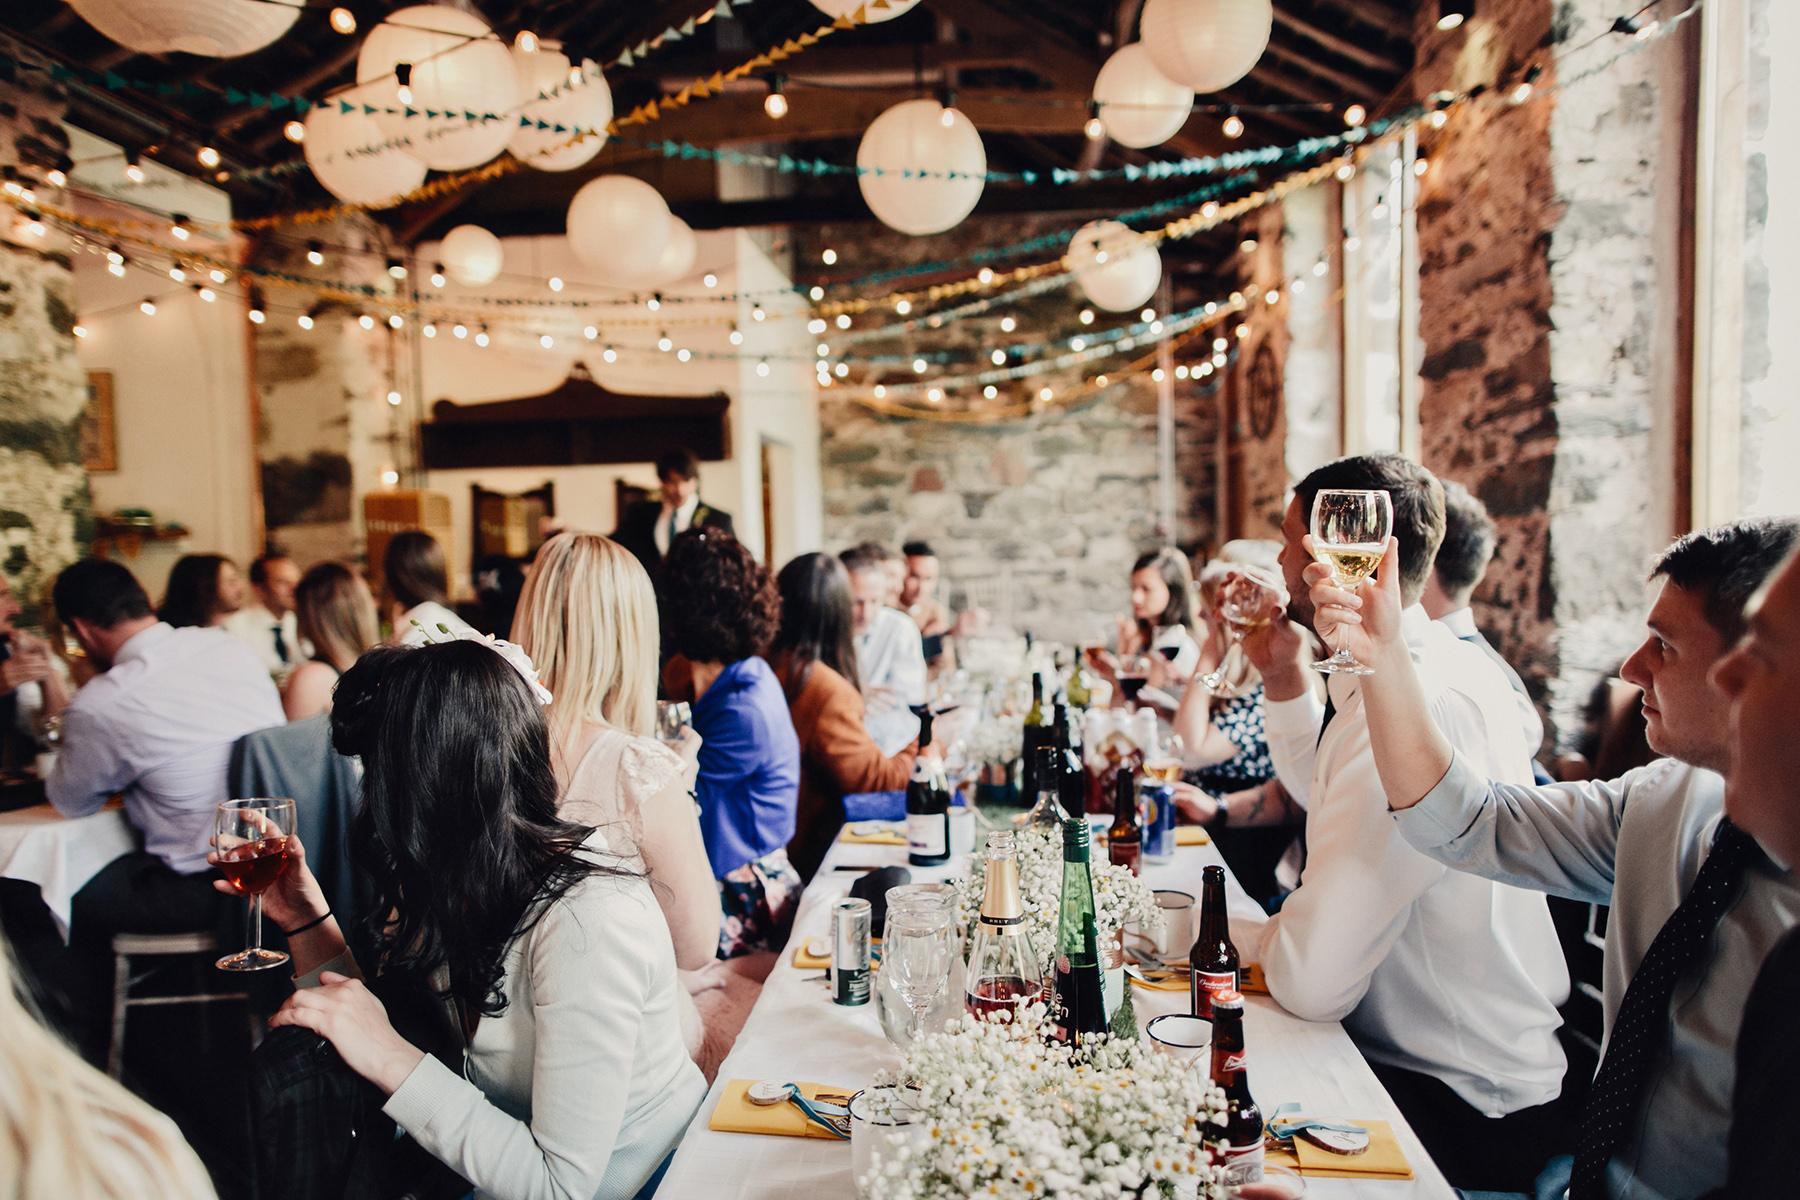 Snowdonia-Wales-Wedding-Photos-0392.jpg